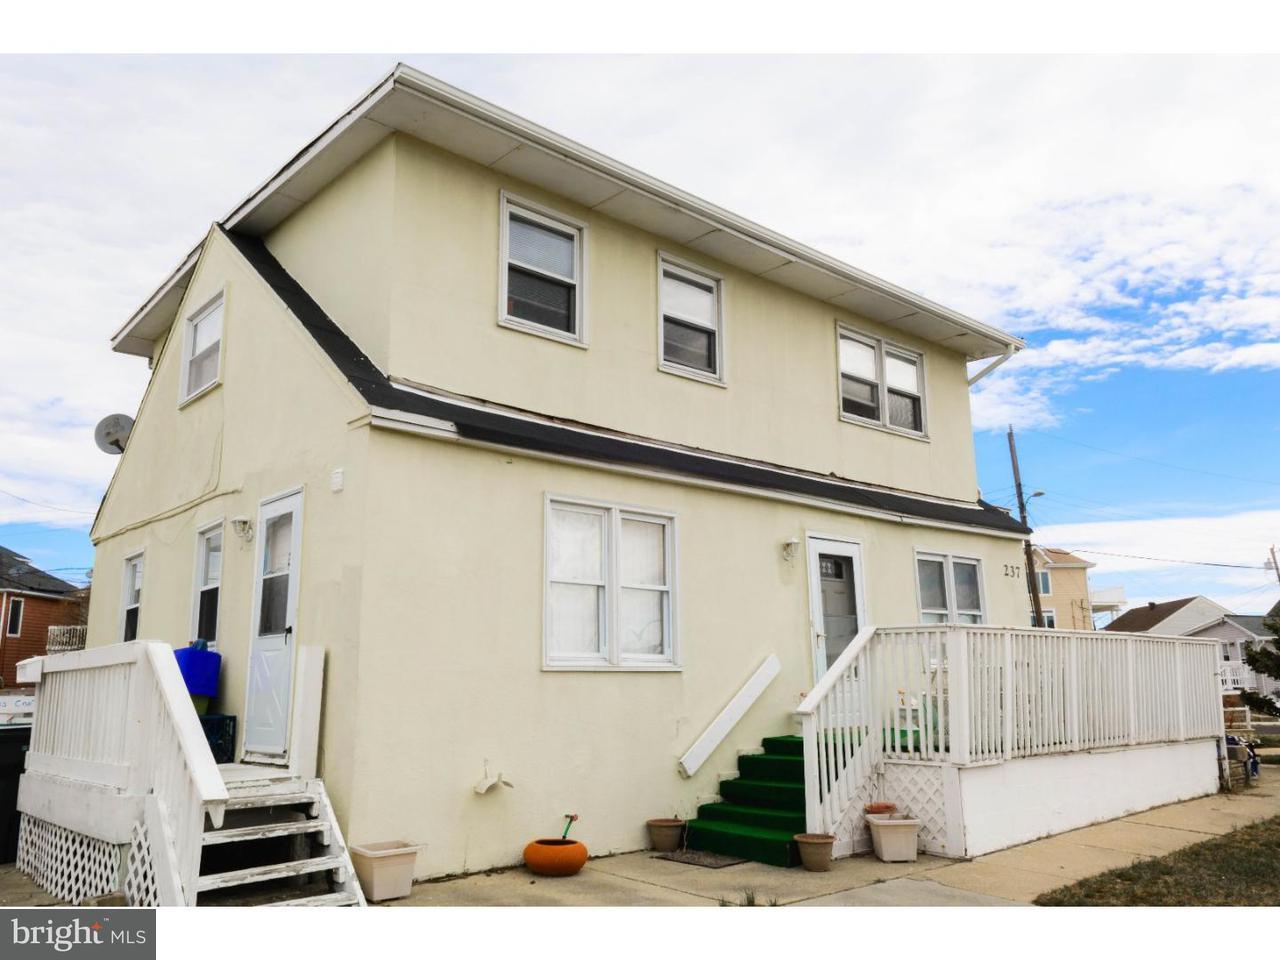 Duplex for Sale at 237 QUAY BLVD Brigantine, New Jersey 08203 United States